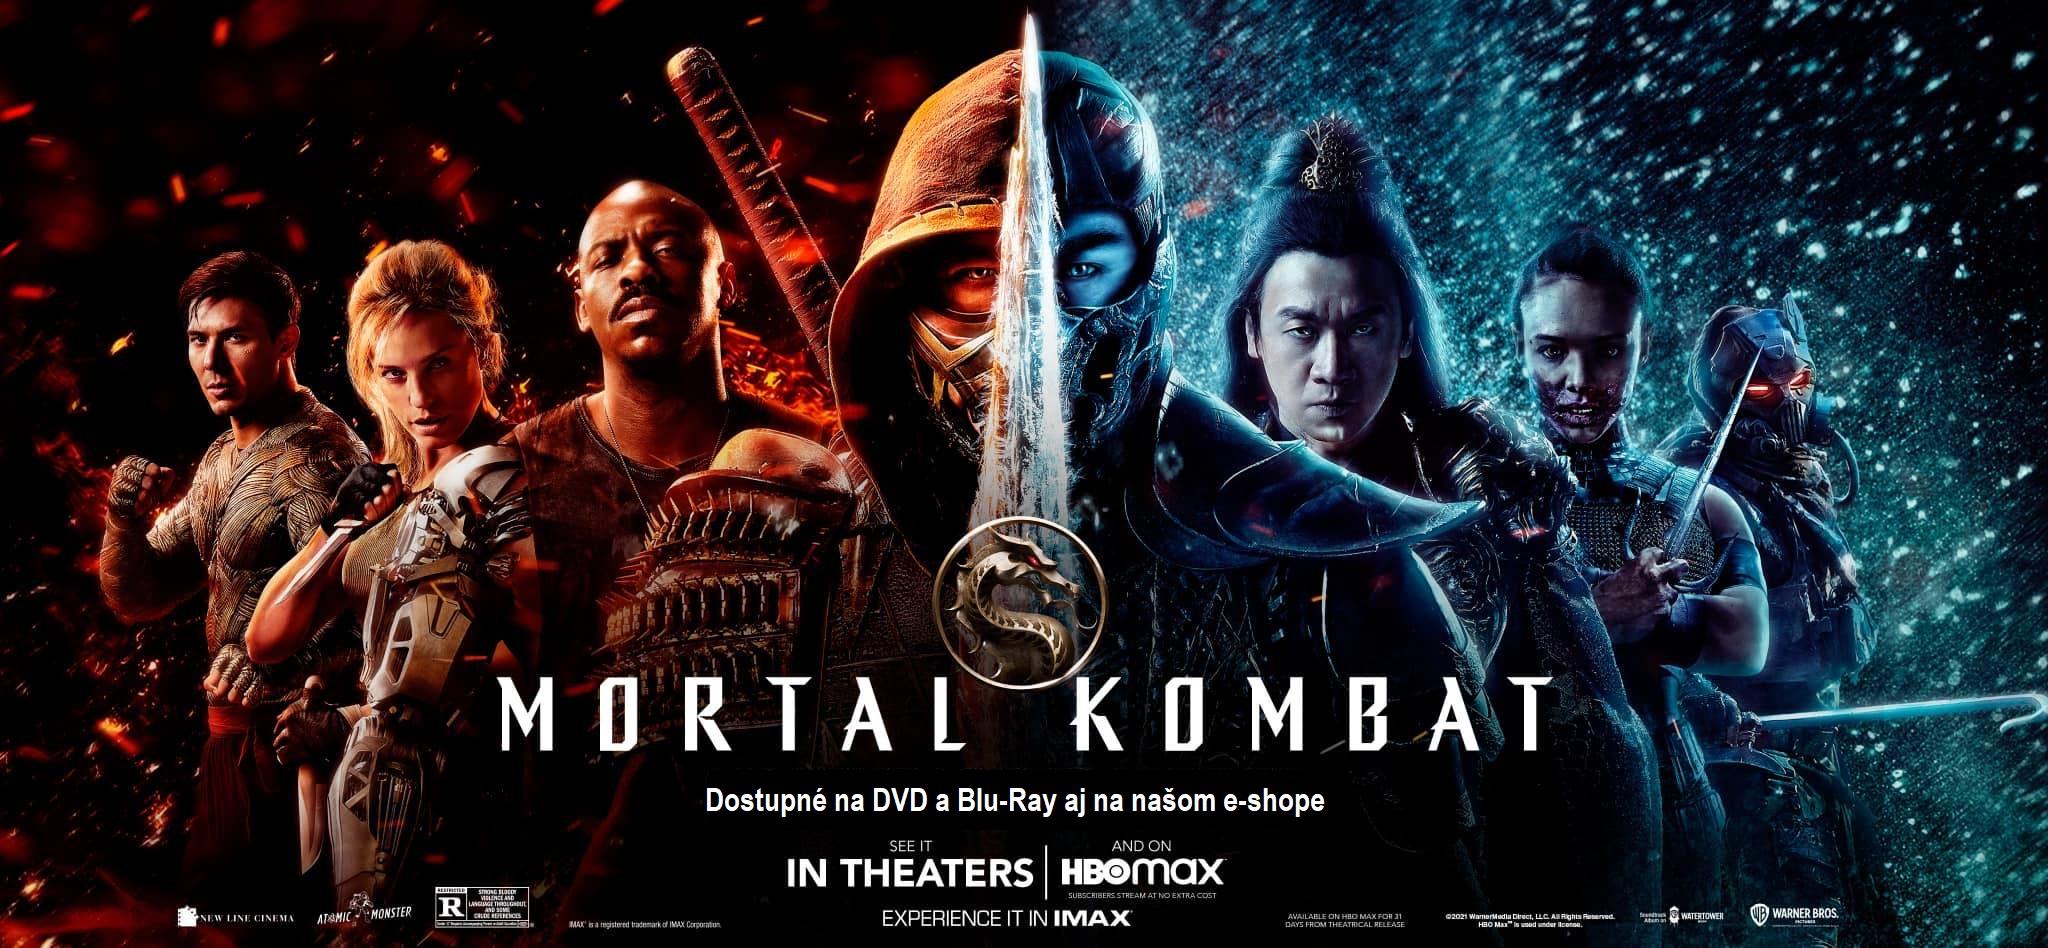 Mortal Kombat DVD a Blu-Ray